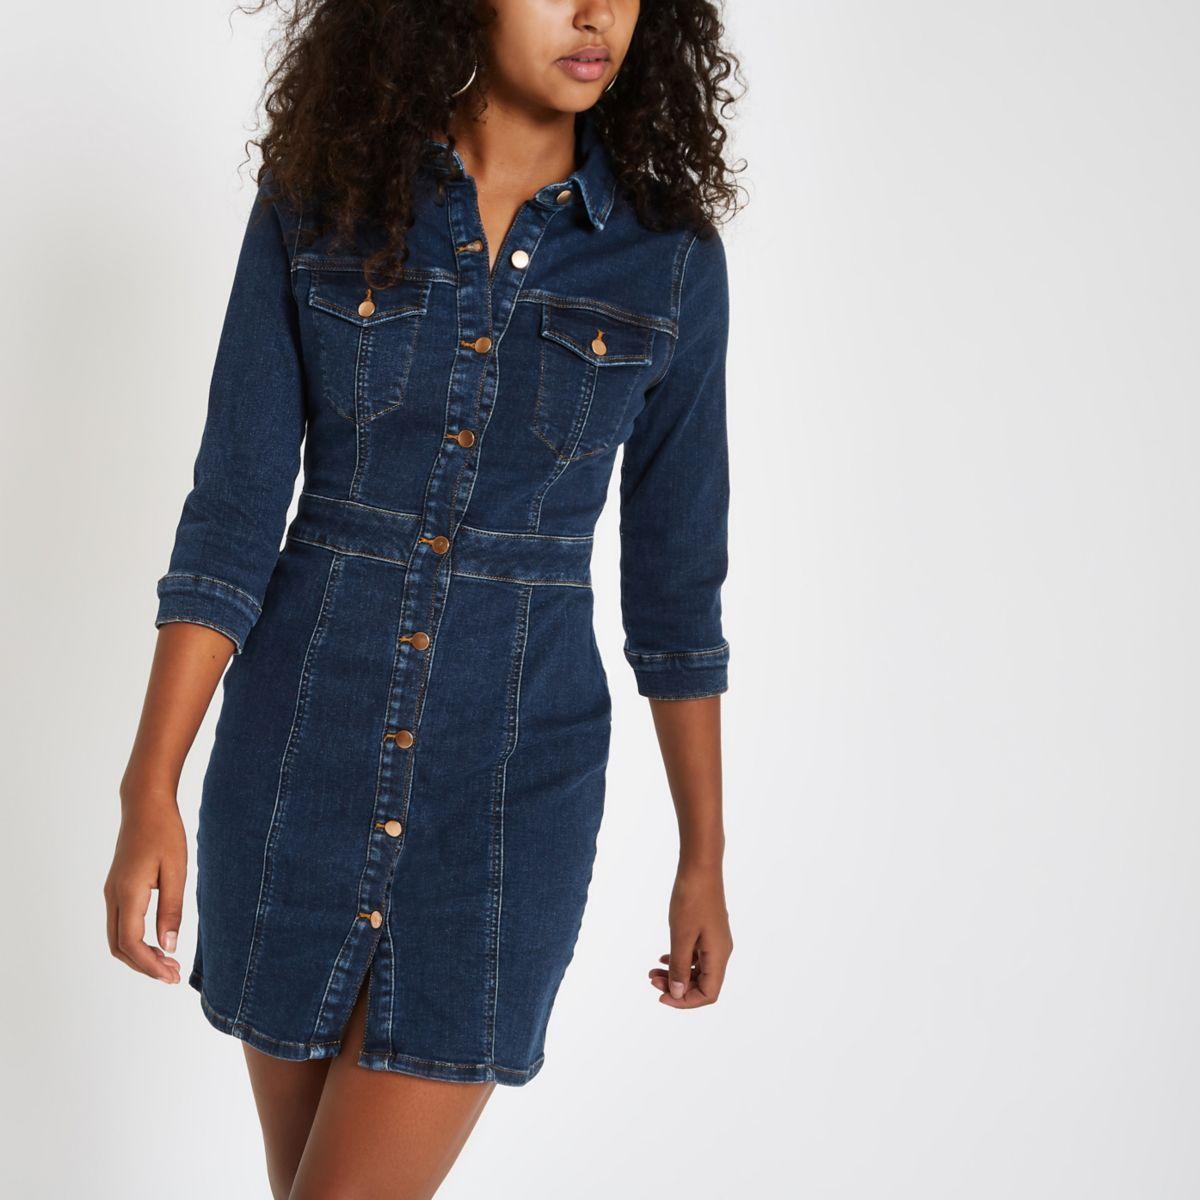 Dark blue denim fitted shirt dress